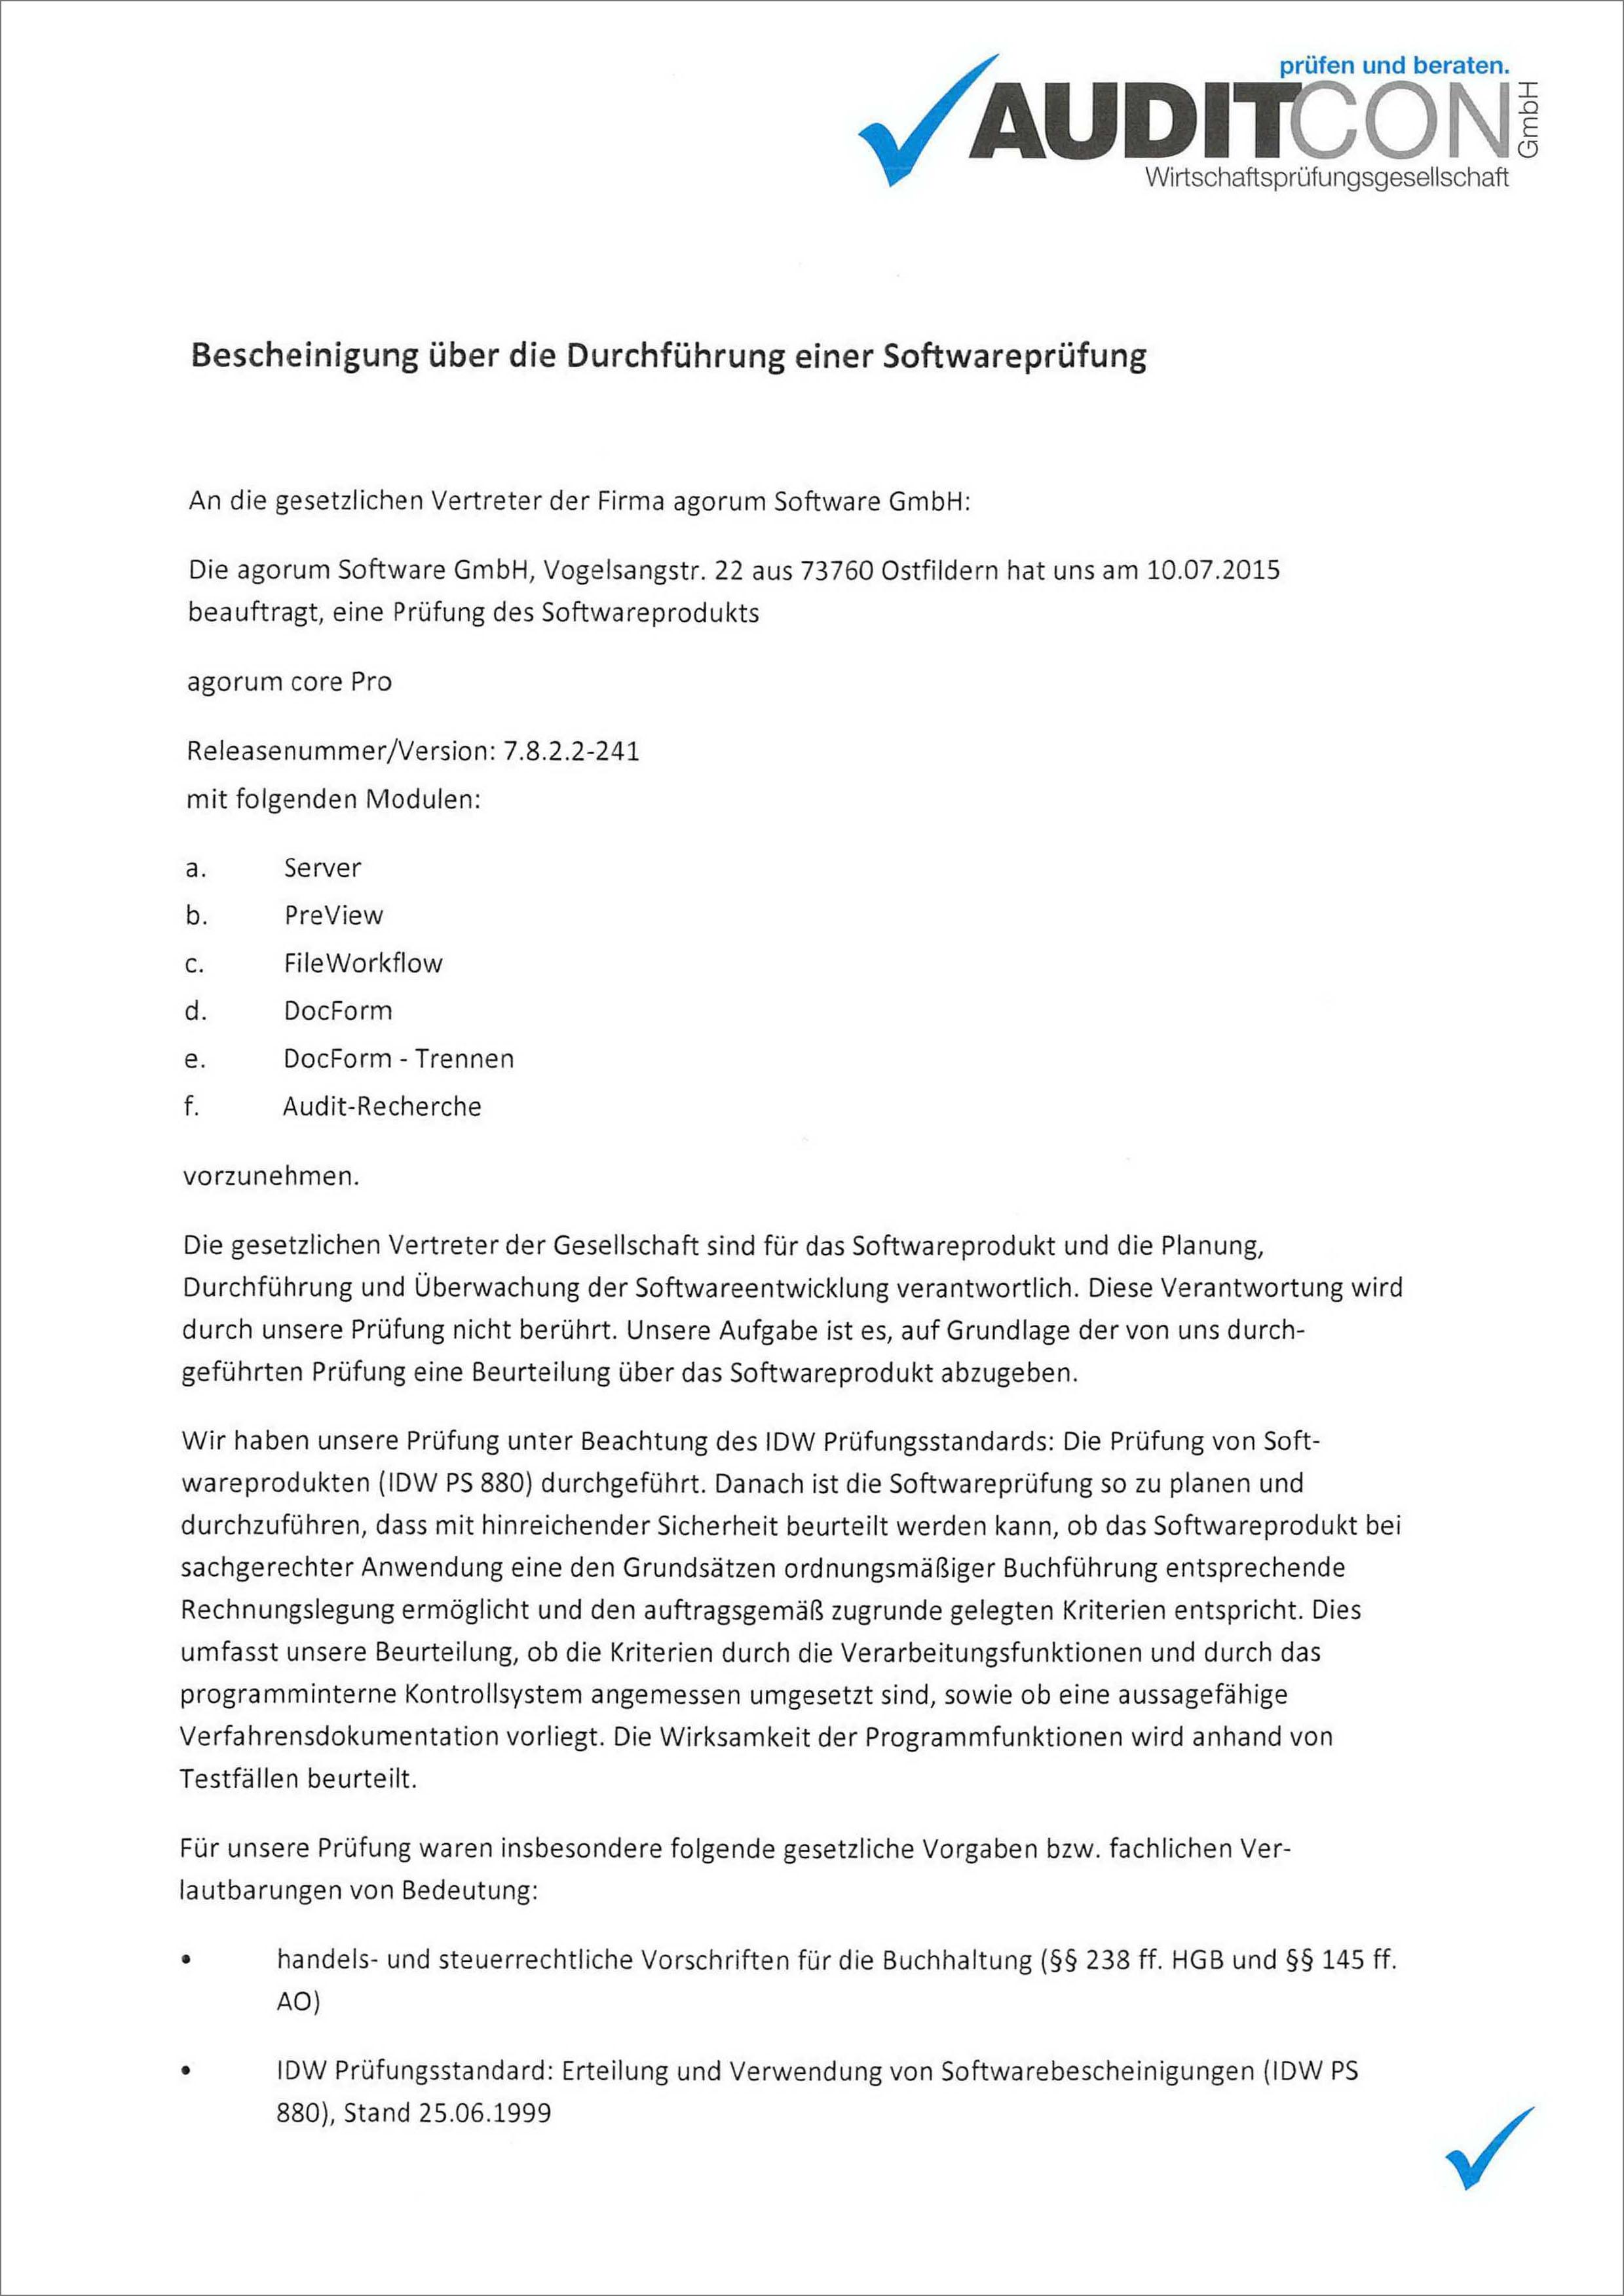 Pruefbericht_GOB_GDPdU-1.jpg